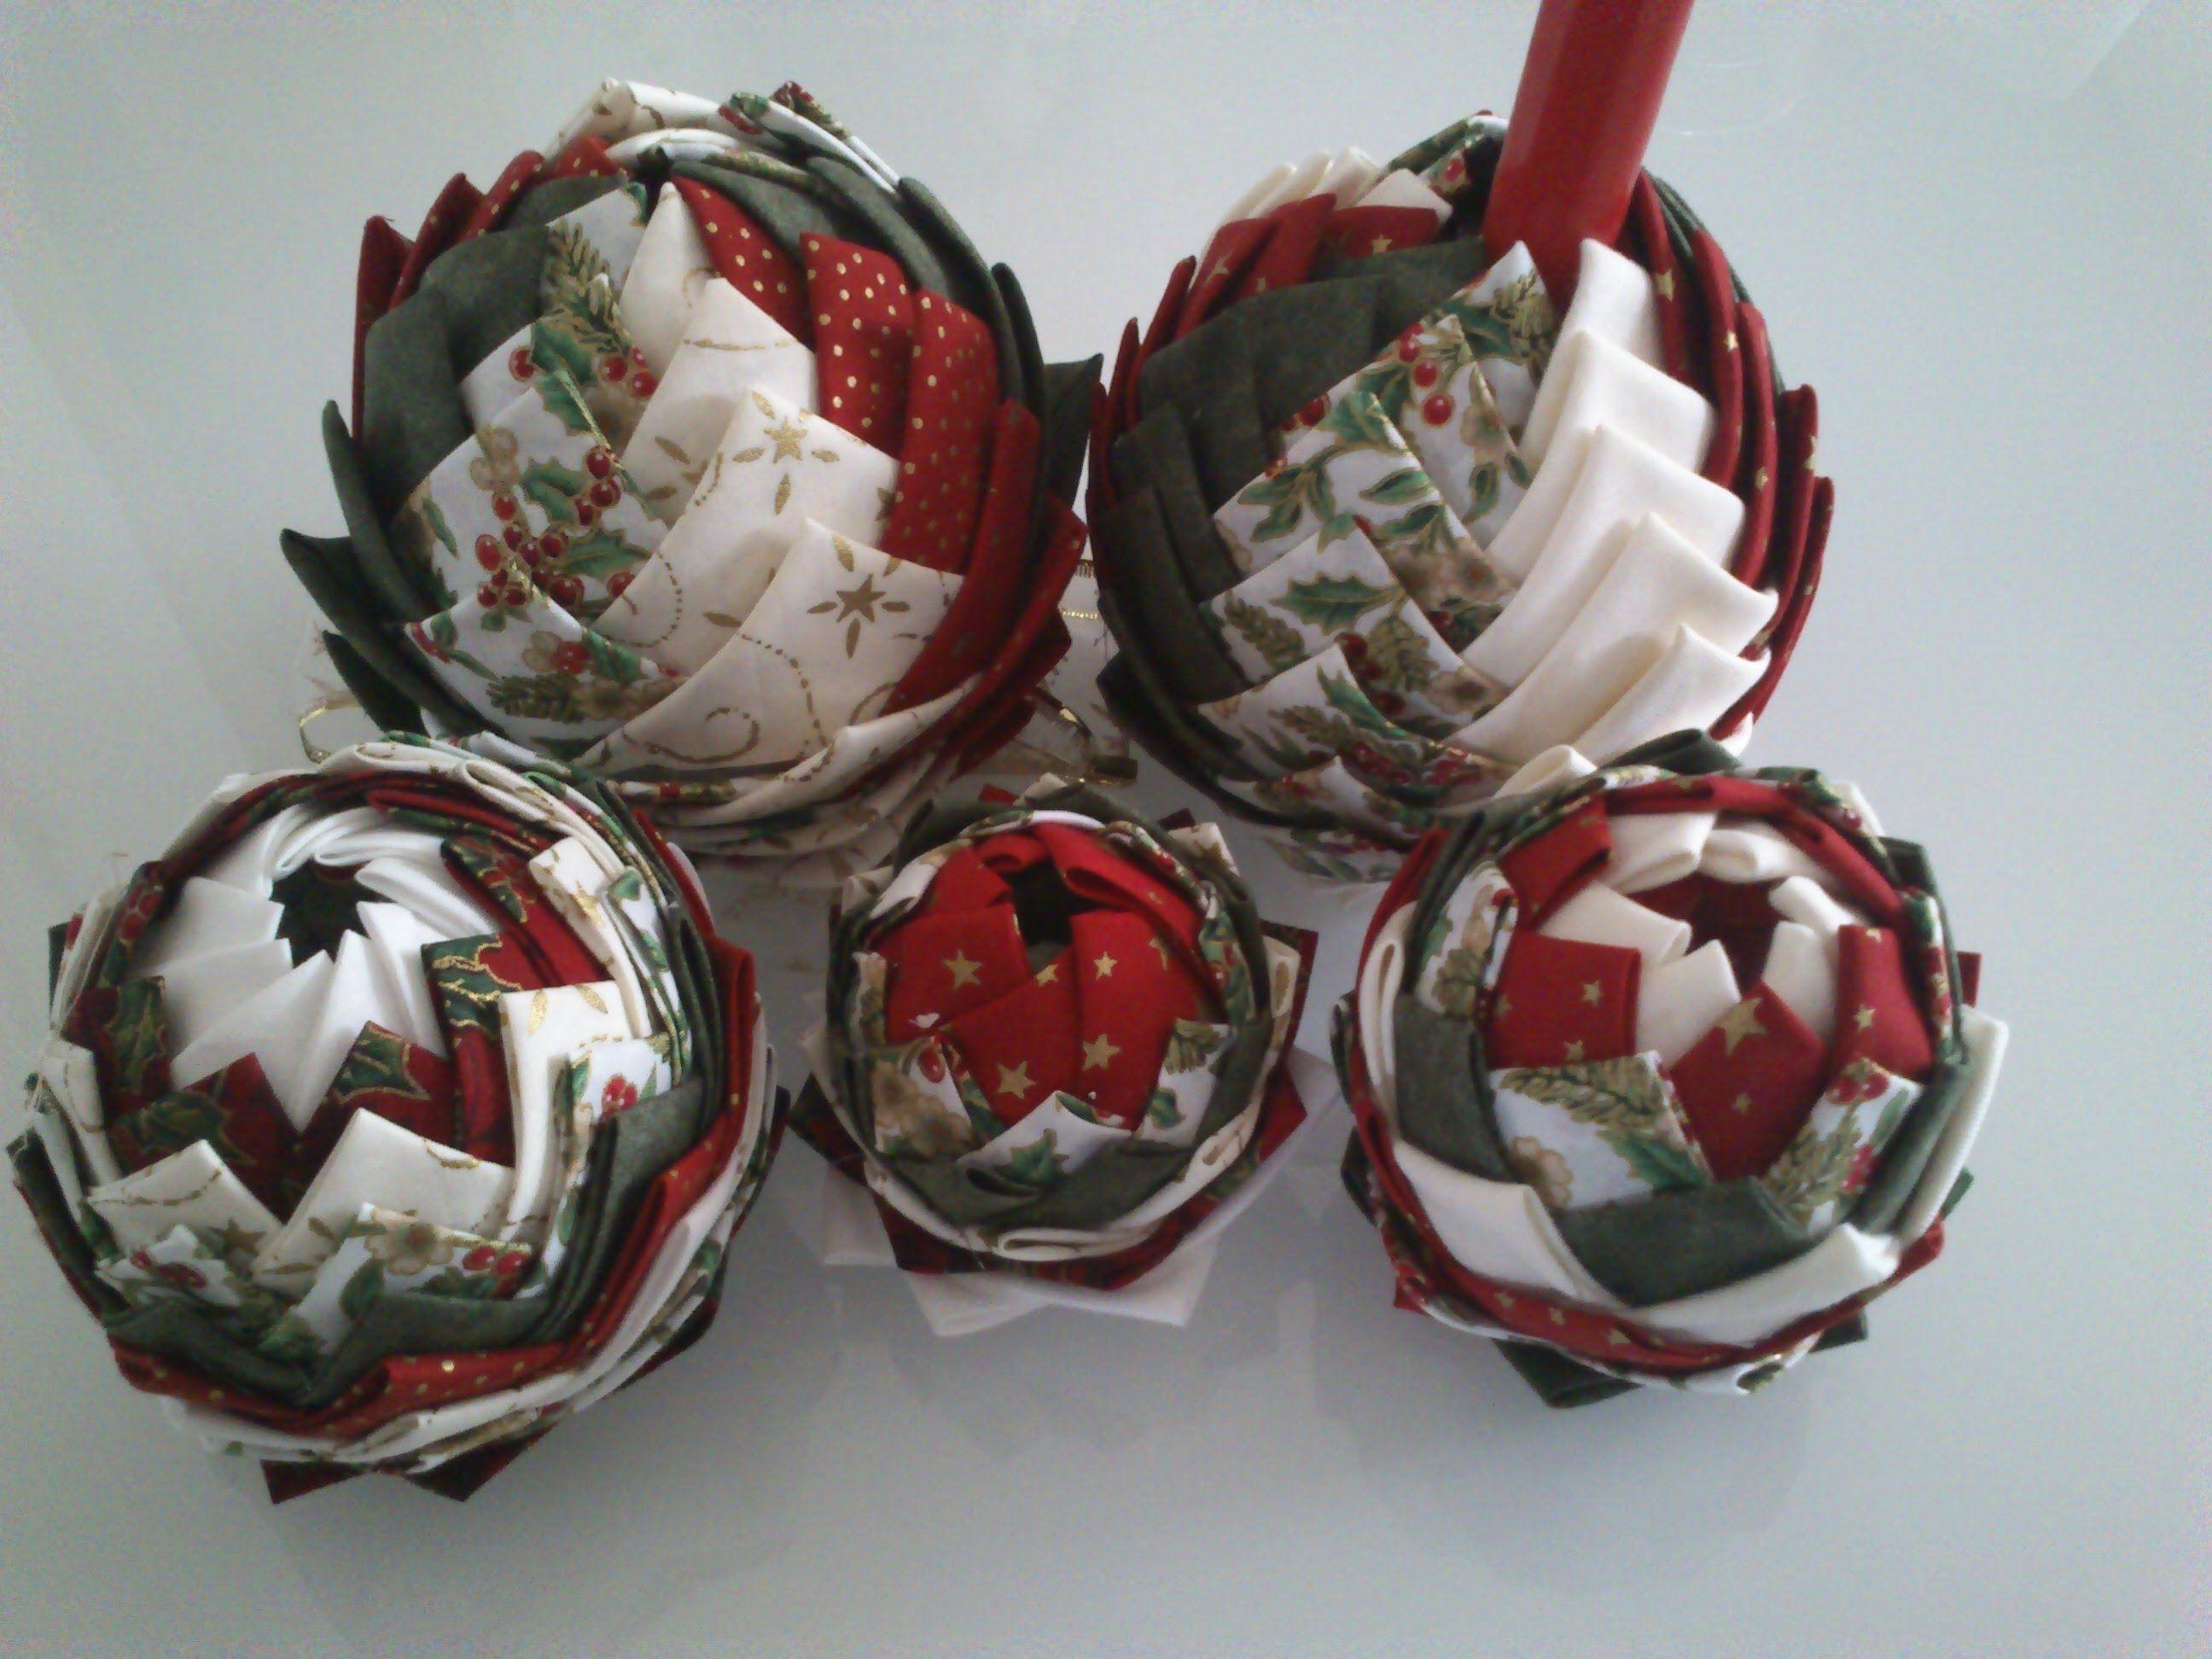 C mo hacer un soporte para velas navide o - Porta velas navidenas ...